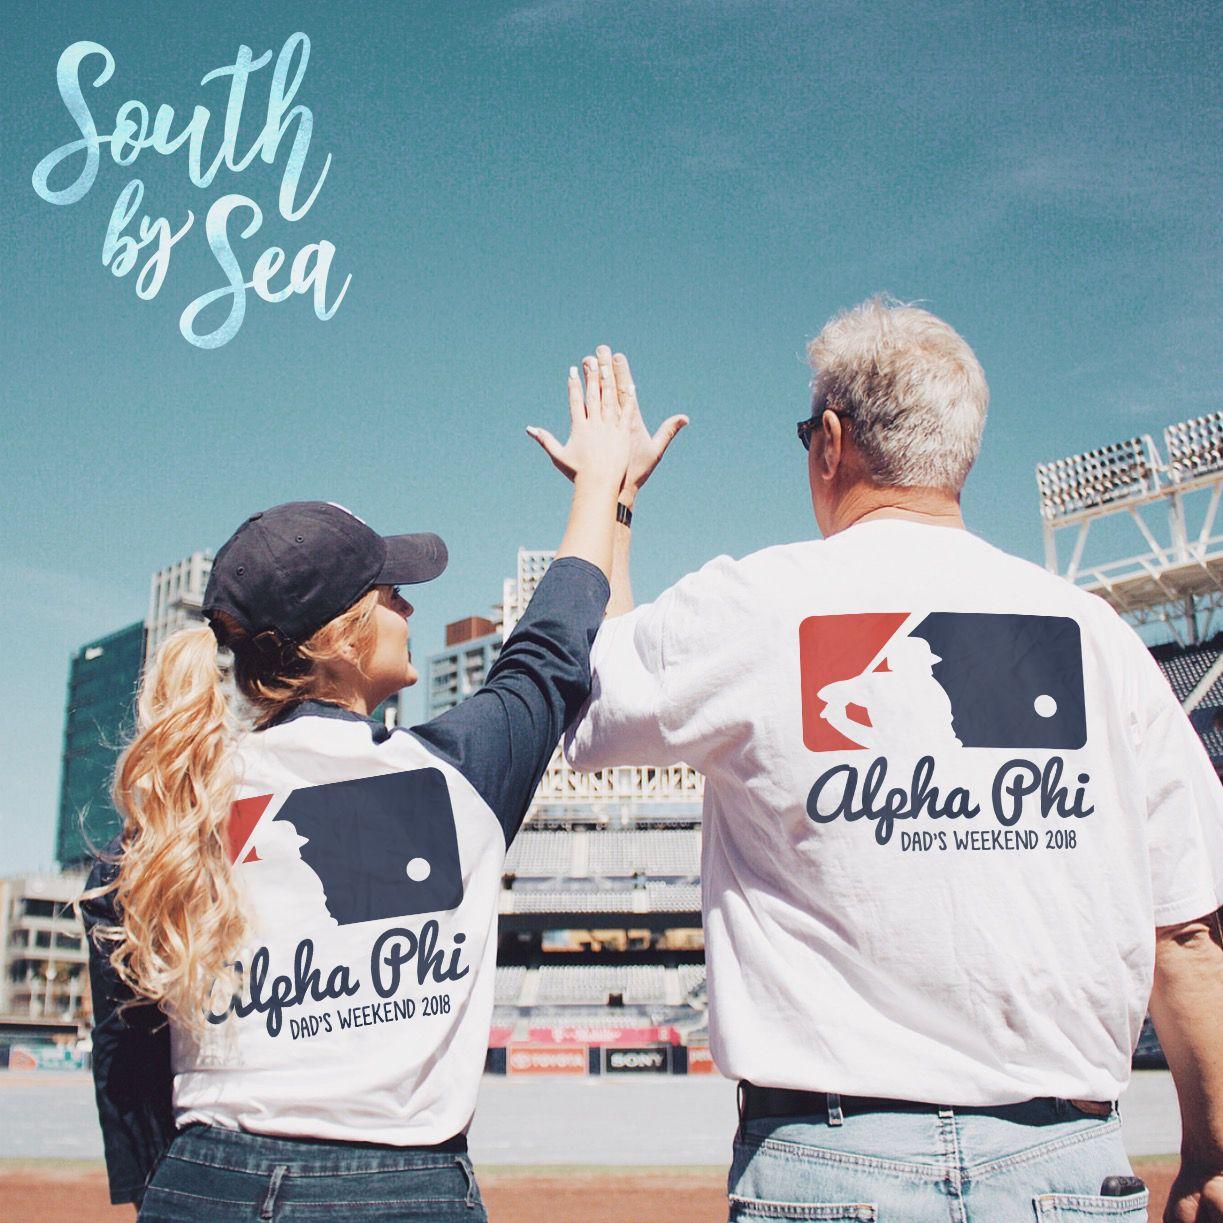 7ebd35d5 Alpha Phi | A Phi | Dad's Weekend Design | Baseball Theme | Grand Slam |  South by Sea | Greek T-Shirts | Custom Greek Apparel | Sorority T-Shirts